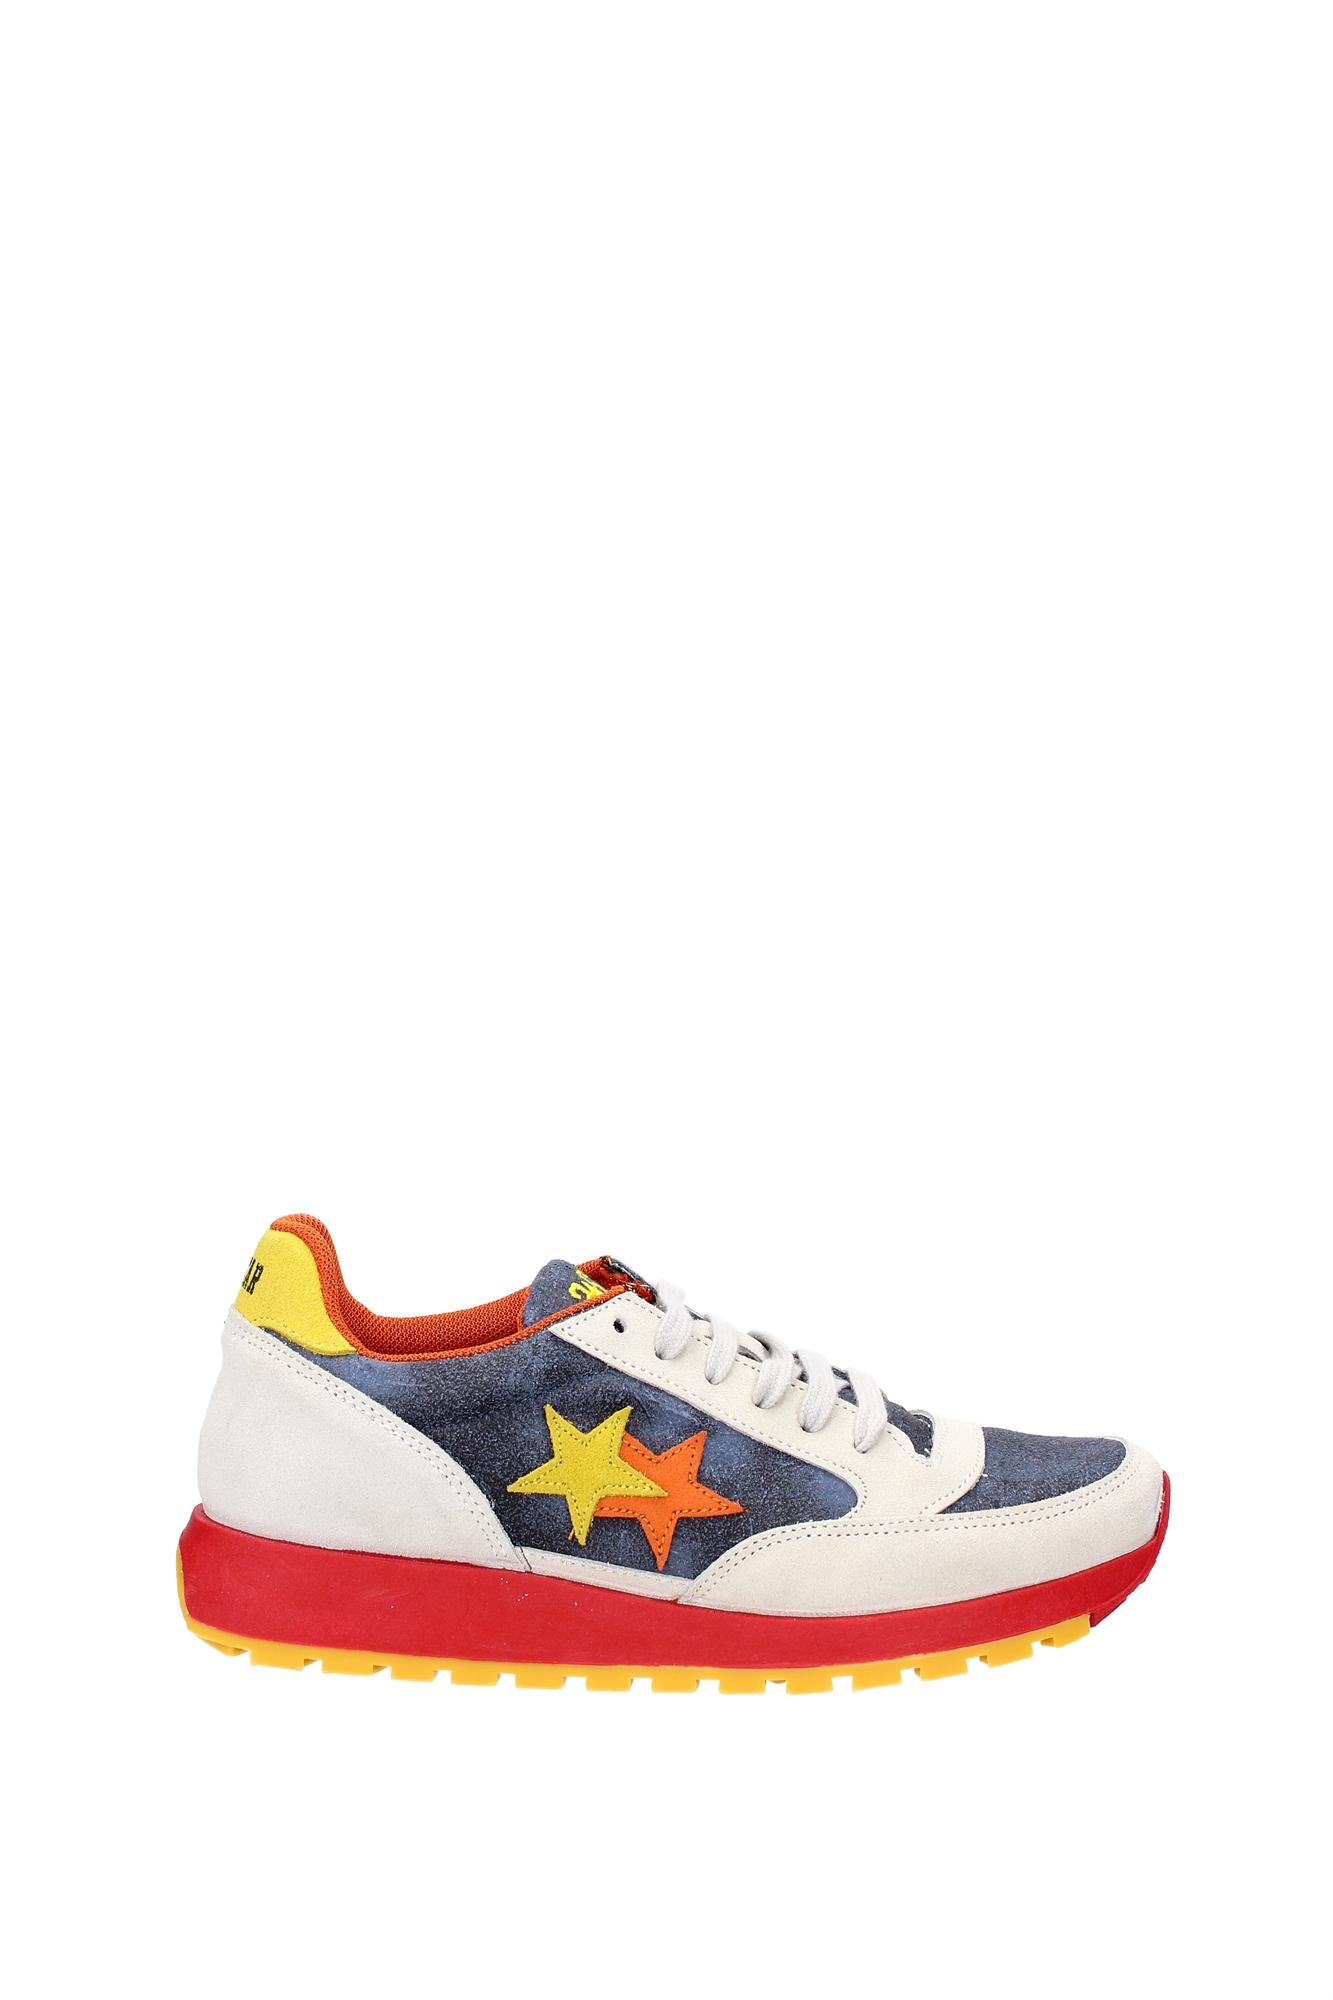 Sneakers 2star Herren - Wildleder Wildleder - (2SU1157BLUGHIACCIO) df5e55